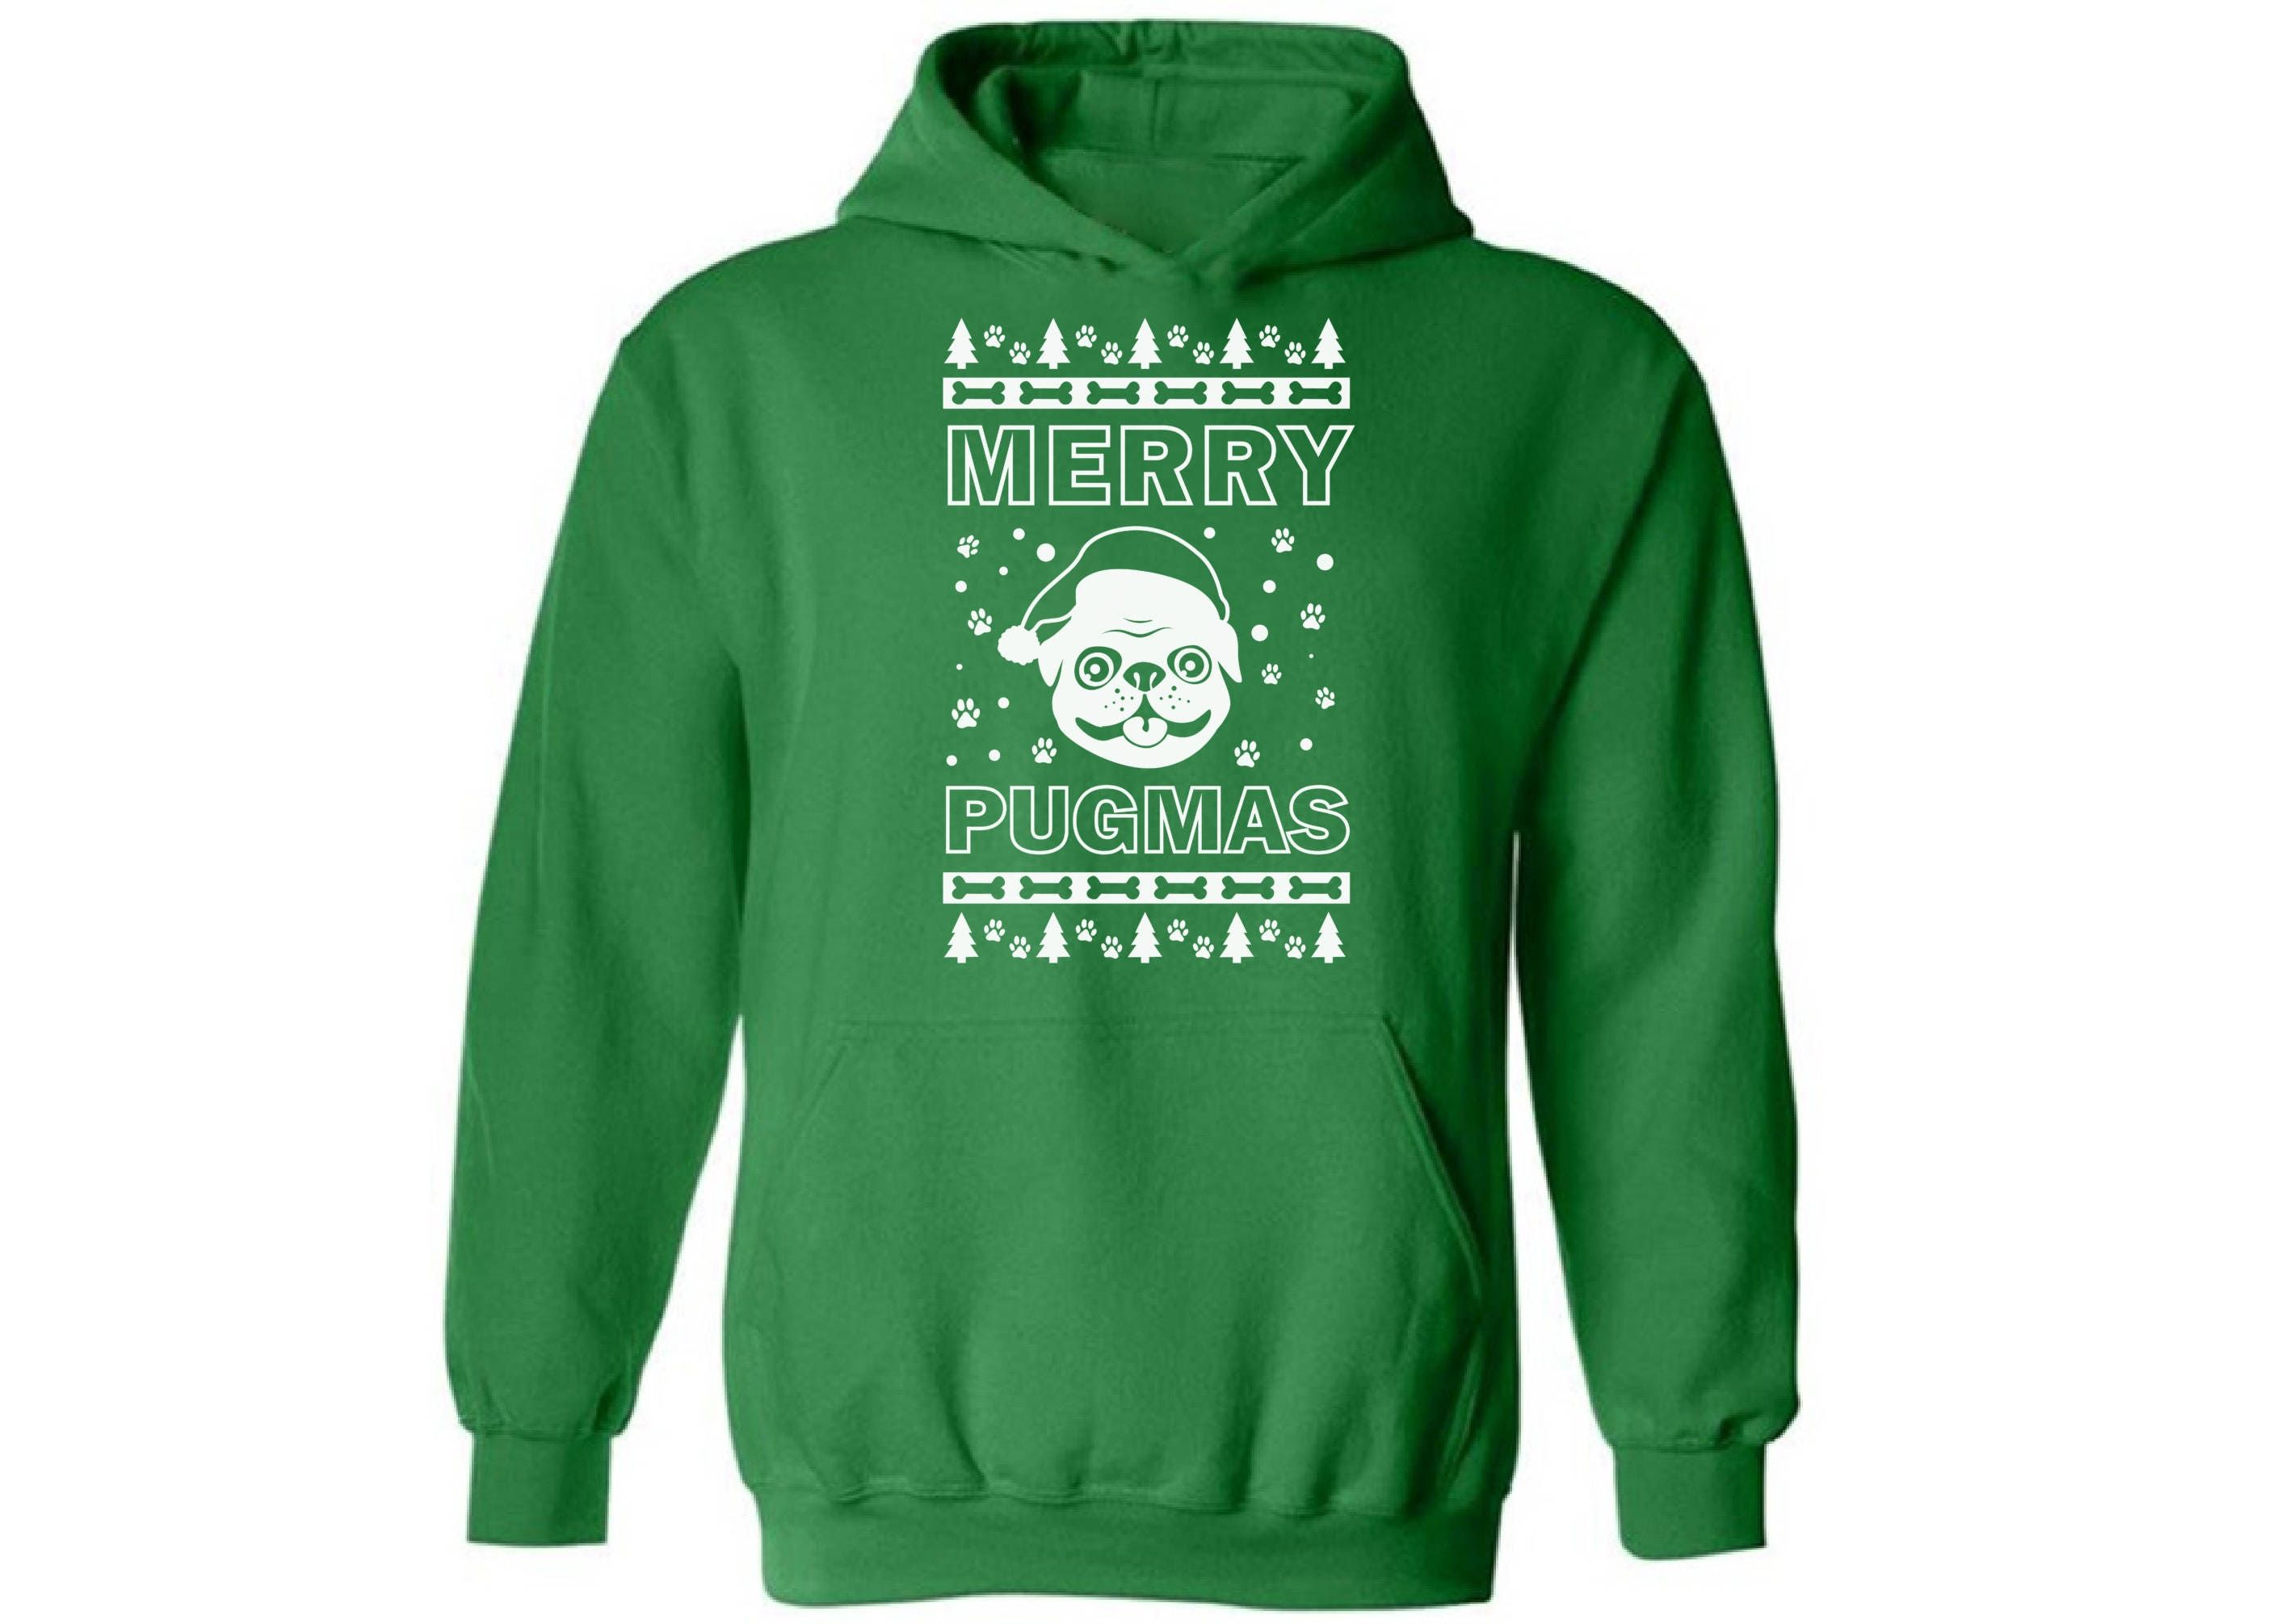 Merry Pugmas Christmas Hooded sweatshirt Xmas sweatshirt for men for women Christmas hoodie Ugly Christmas sweater